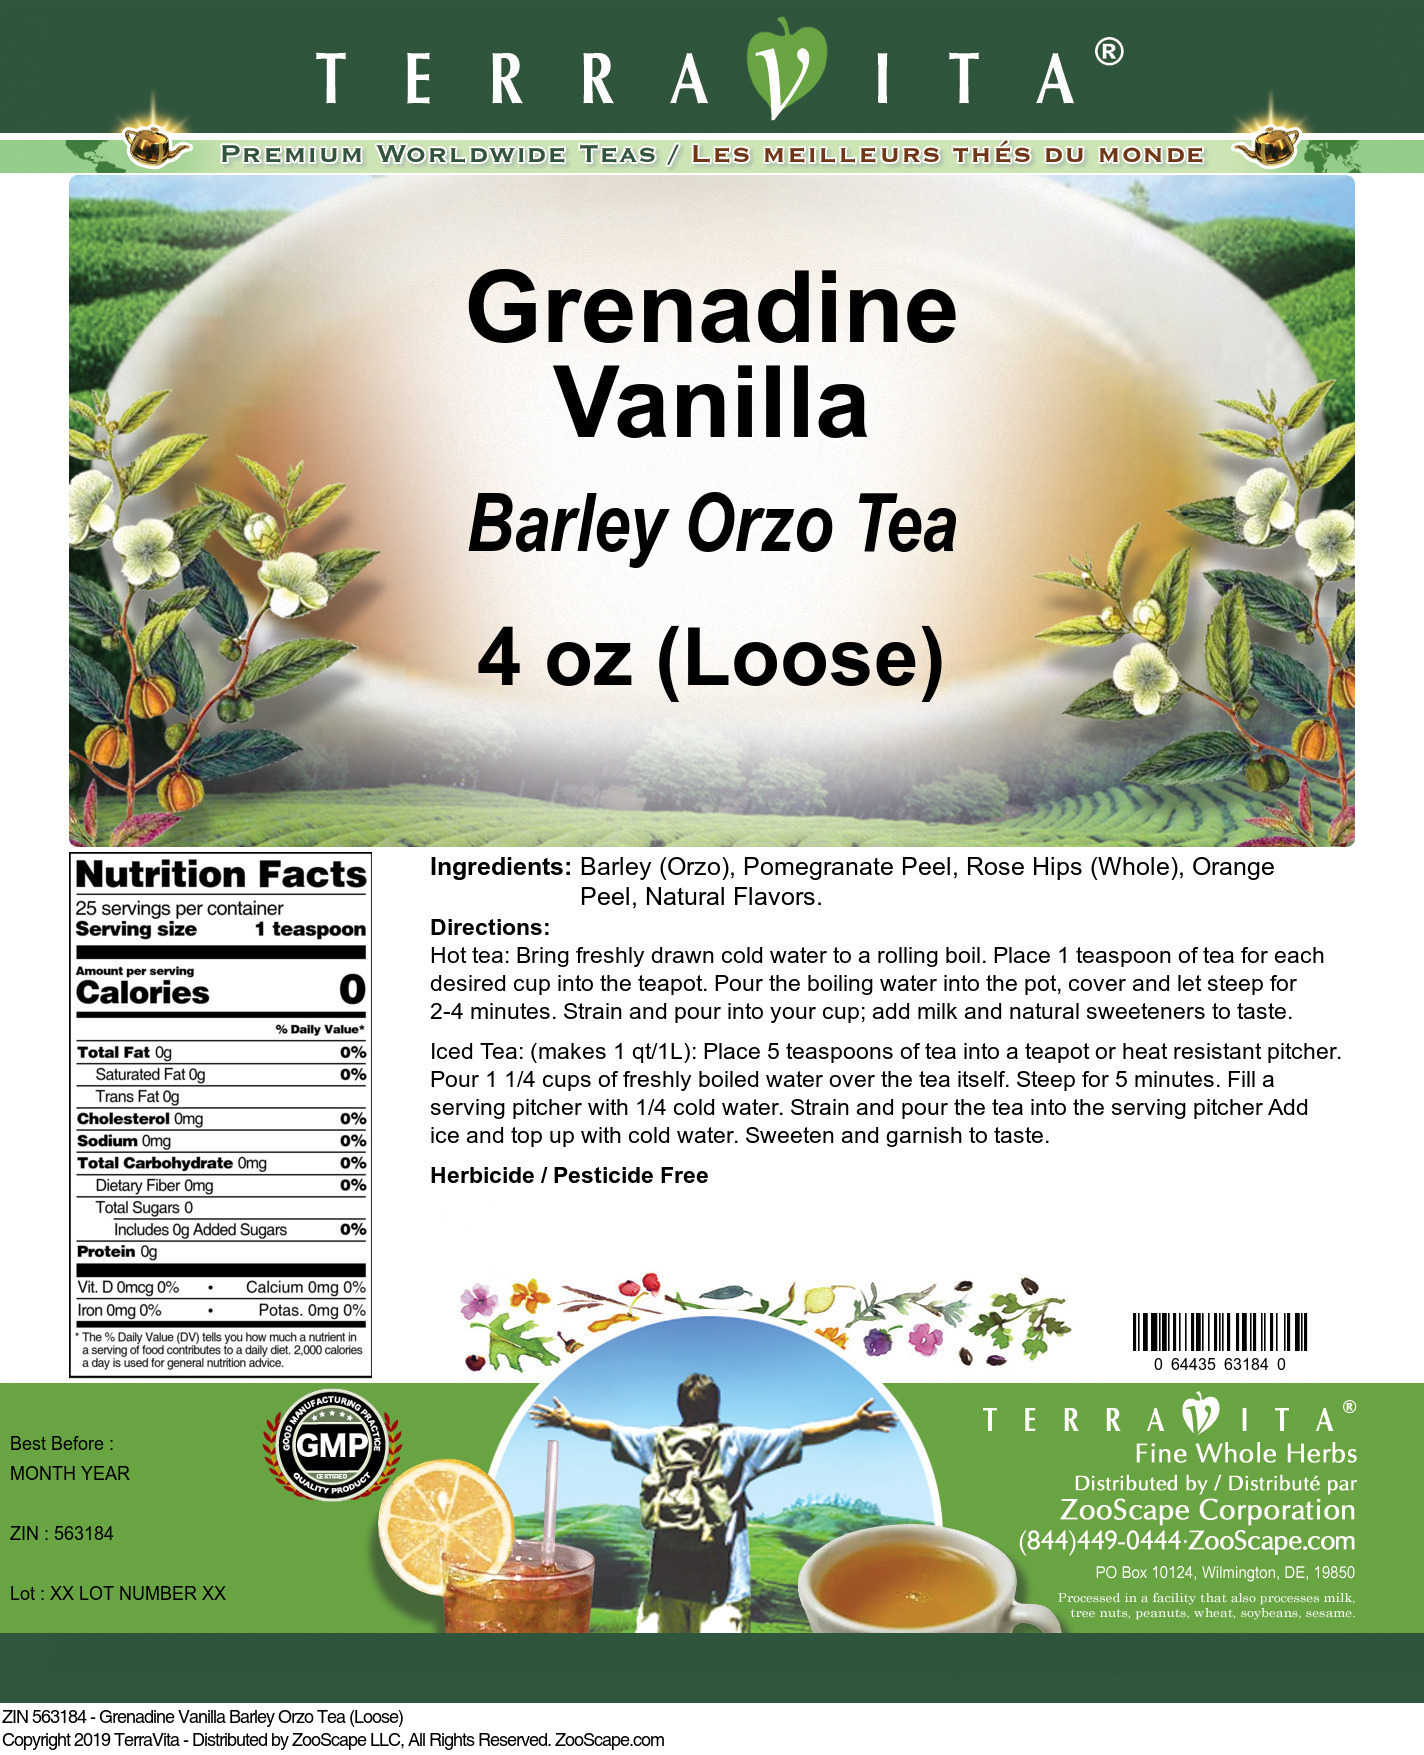 Grenadine Vanilla Barley Orzo Tea (Loose)